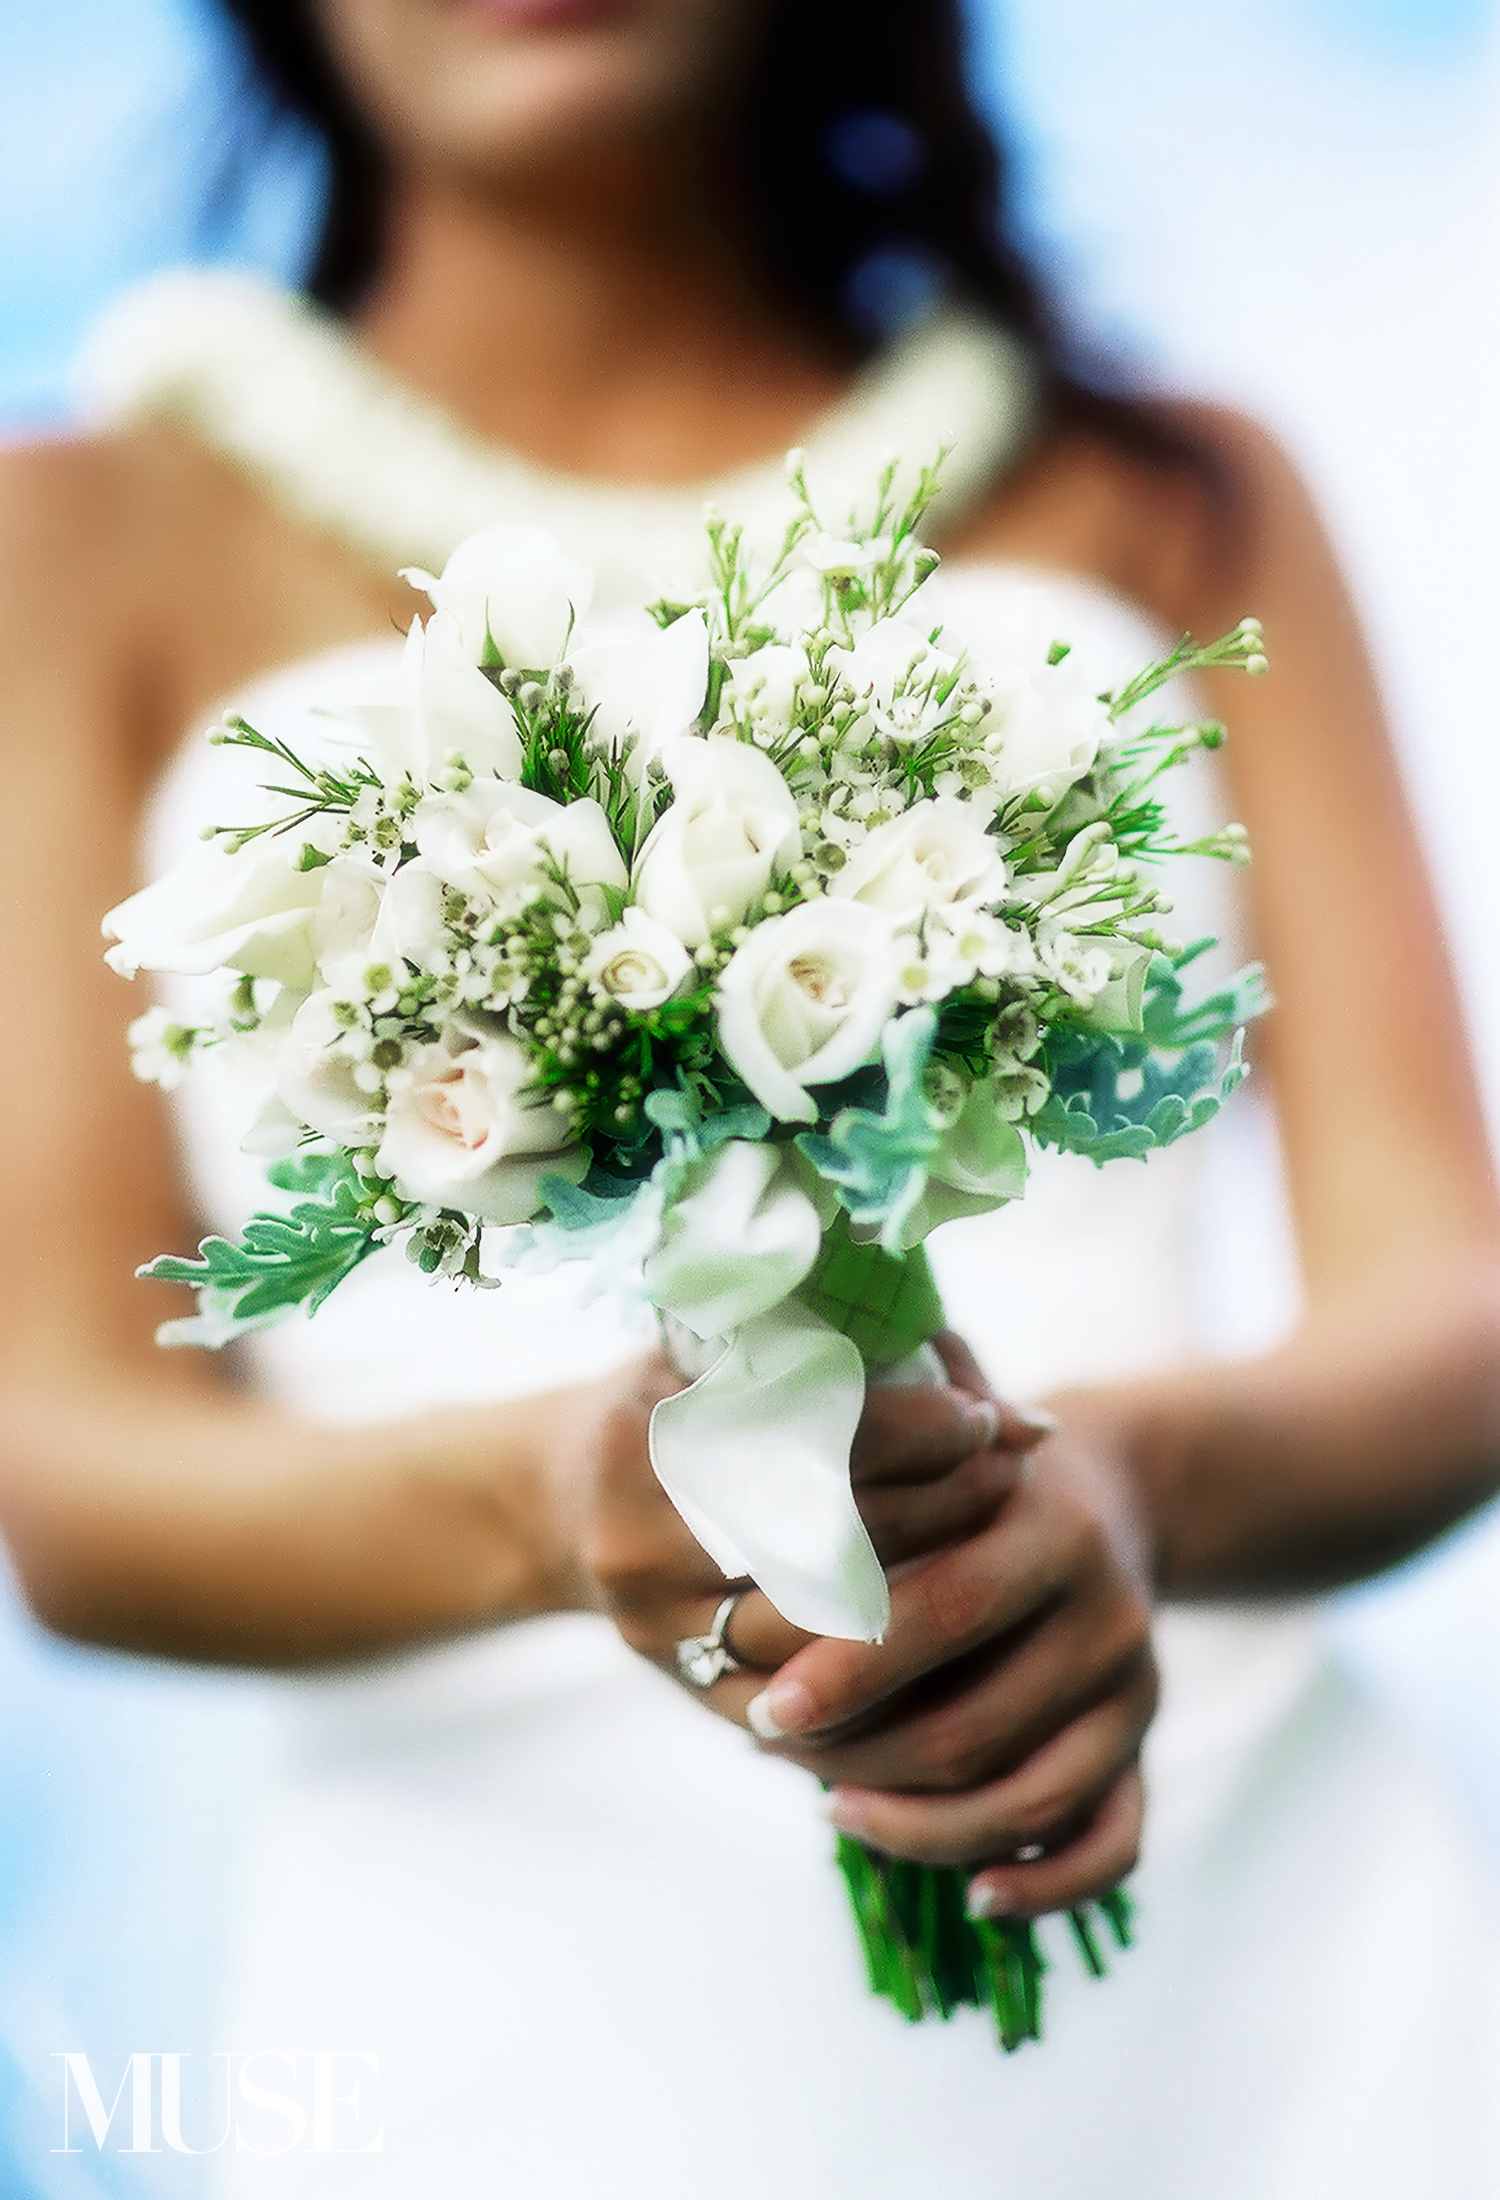 MUSE Bride - Wedding Flowers